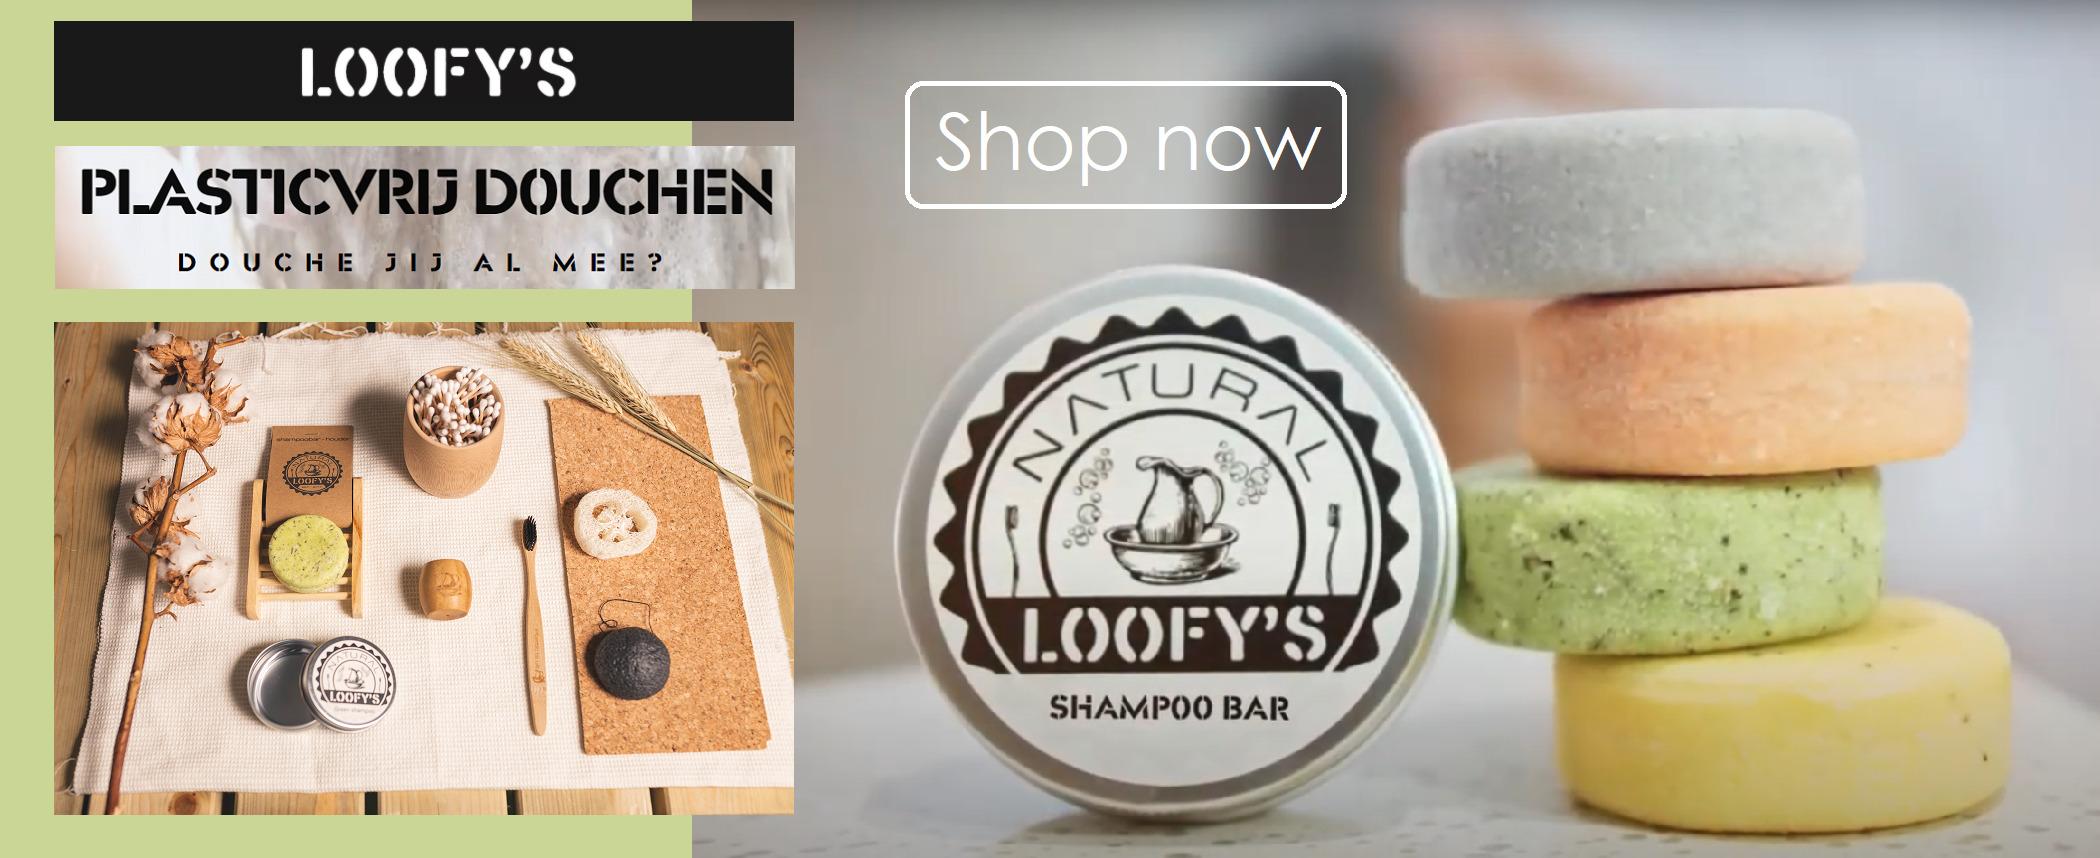 Loofy's